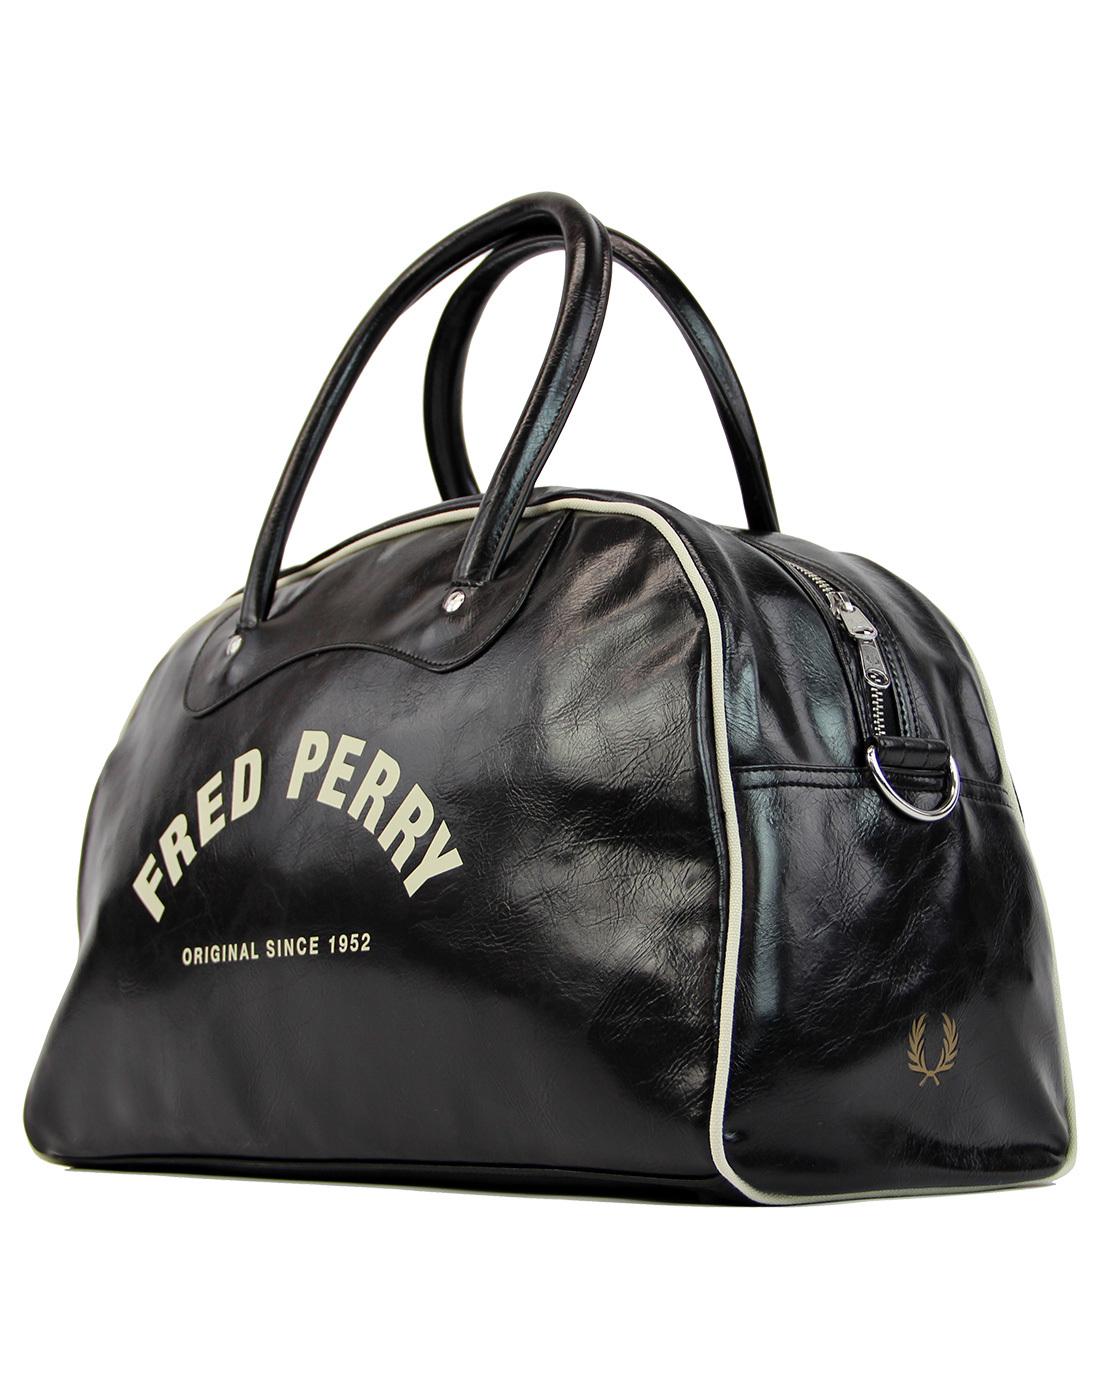 FRED PERRY Retro Classic Grip Weekend Bag B/W